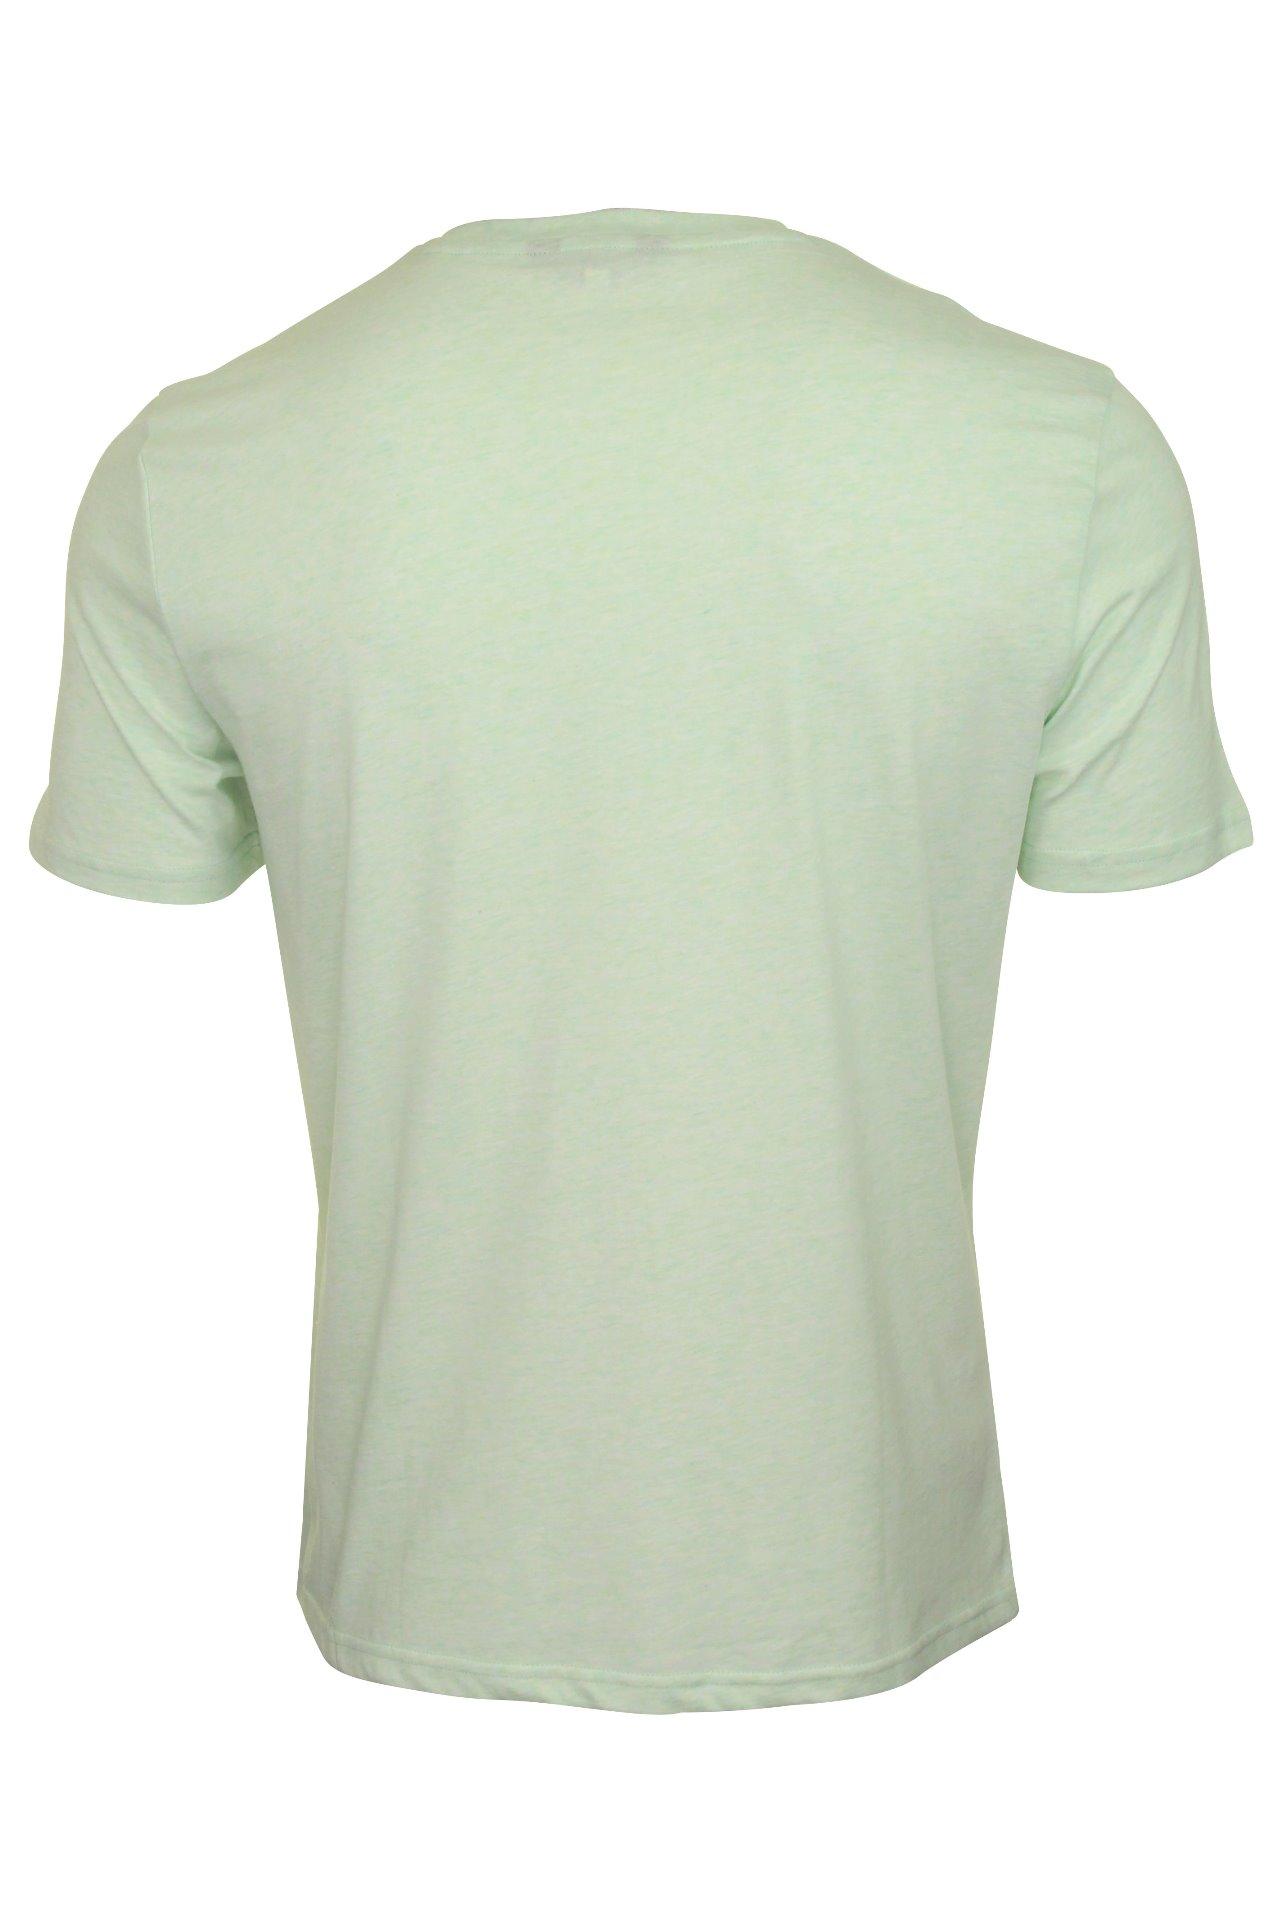 Mens-Classic-Spade-Pocket-T-Shirt-by-Ben-Sherman thumbnail 22